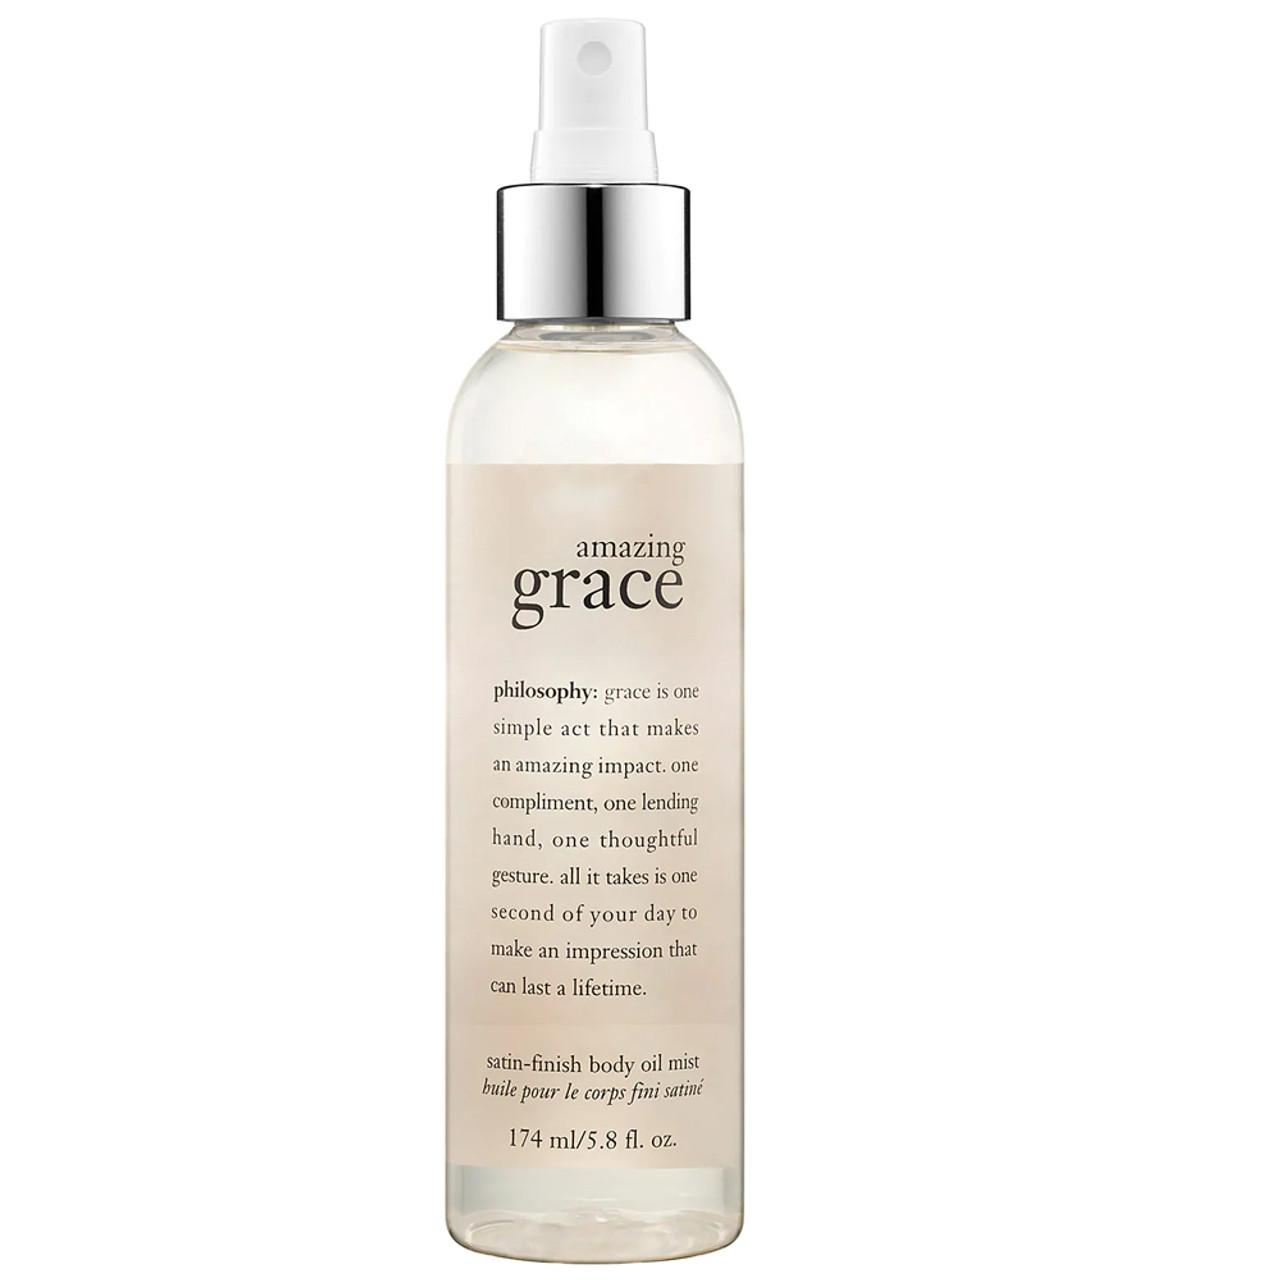 philosophy Amazing Grace Satin-Finish Body Oil Mist BeautifiedYou.com